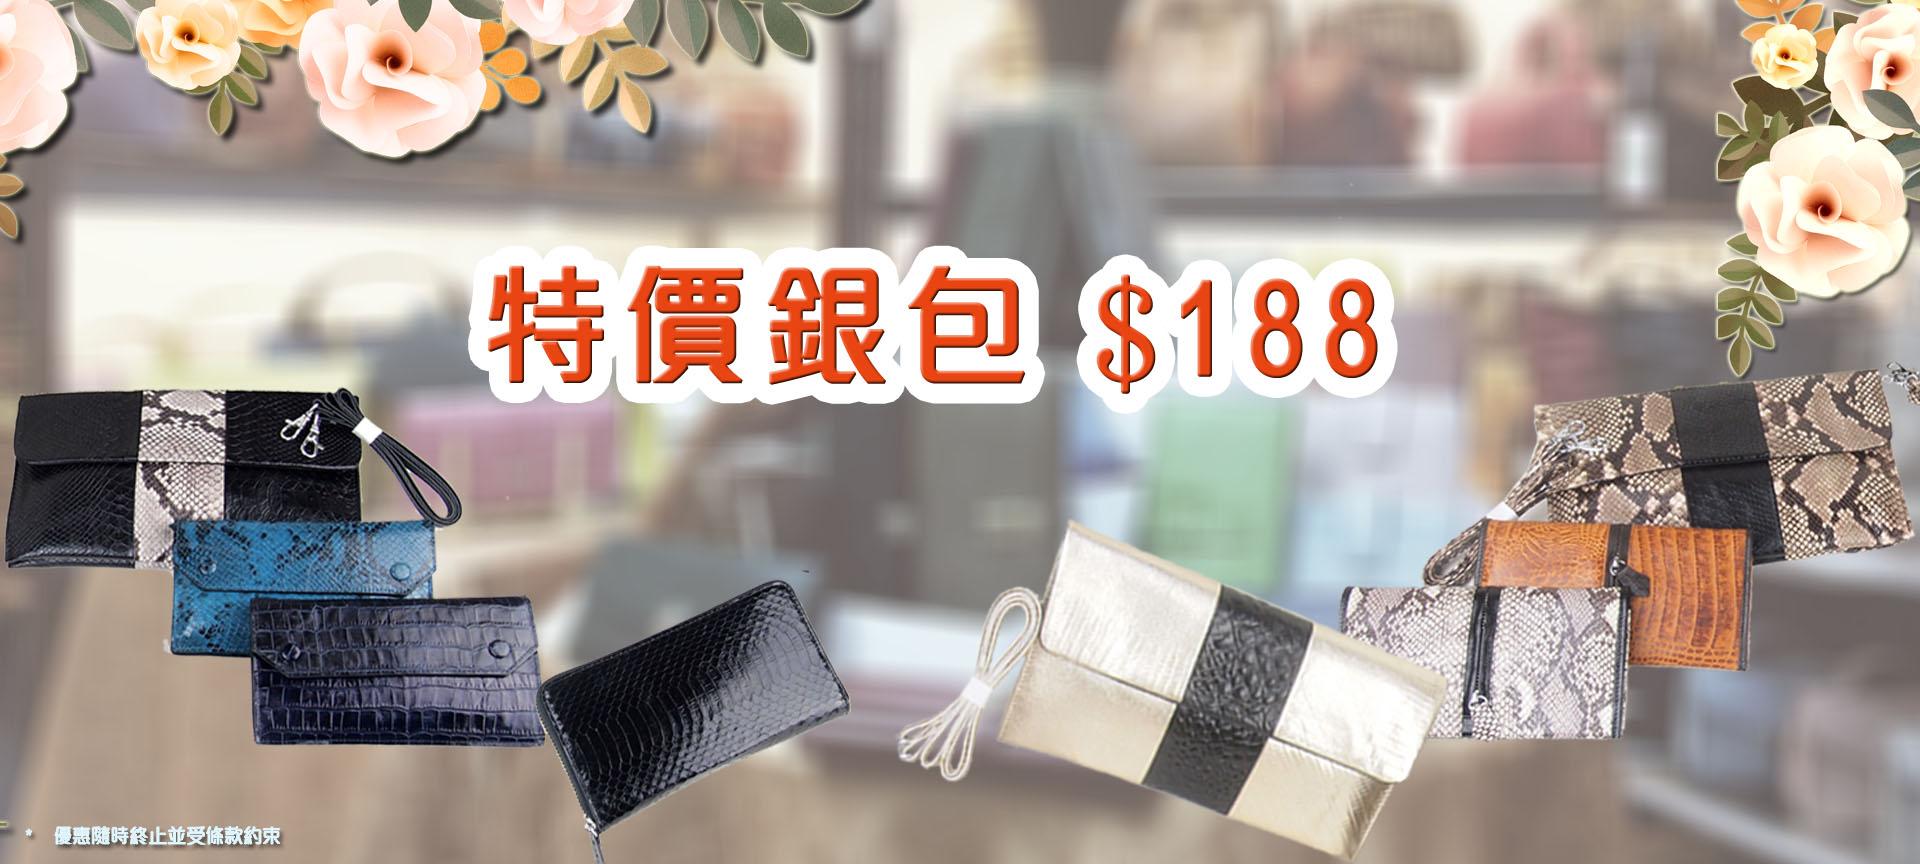 Selected Wallet Sale at Lotusting Genuine Leather Bags